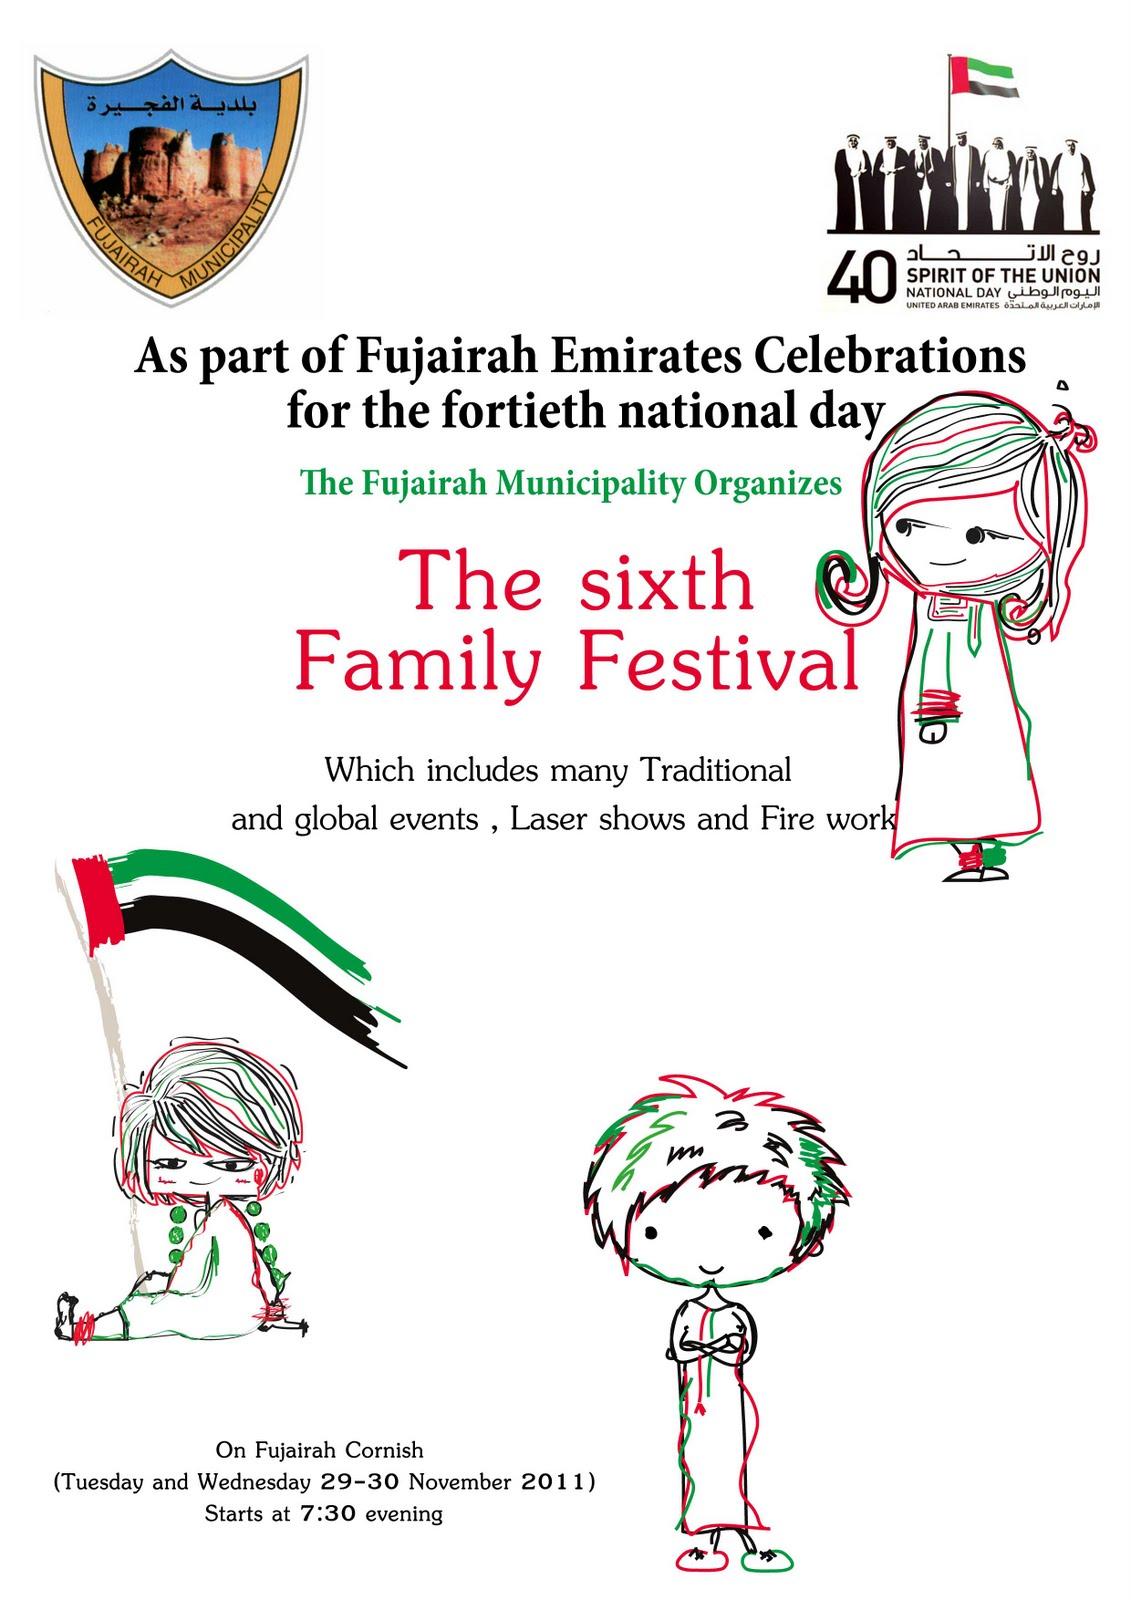 Fujairah In Focus Sixth Family Festival Featured In